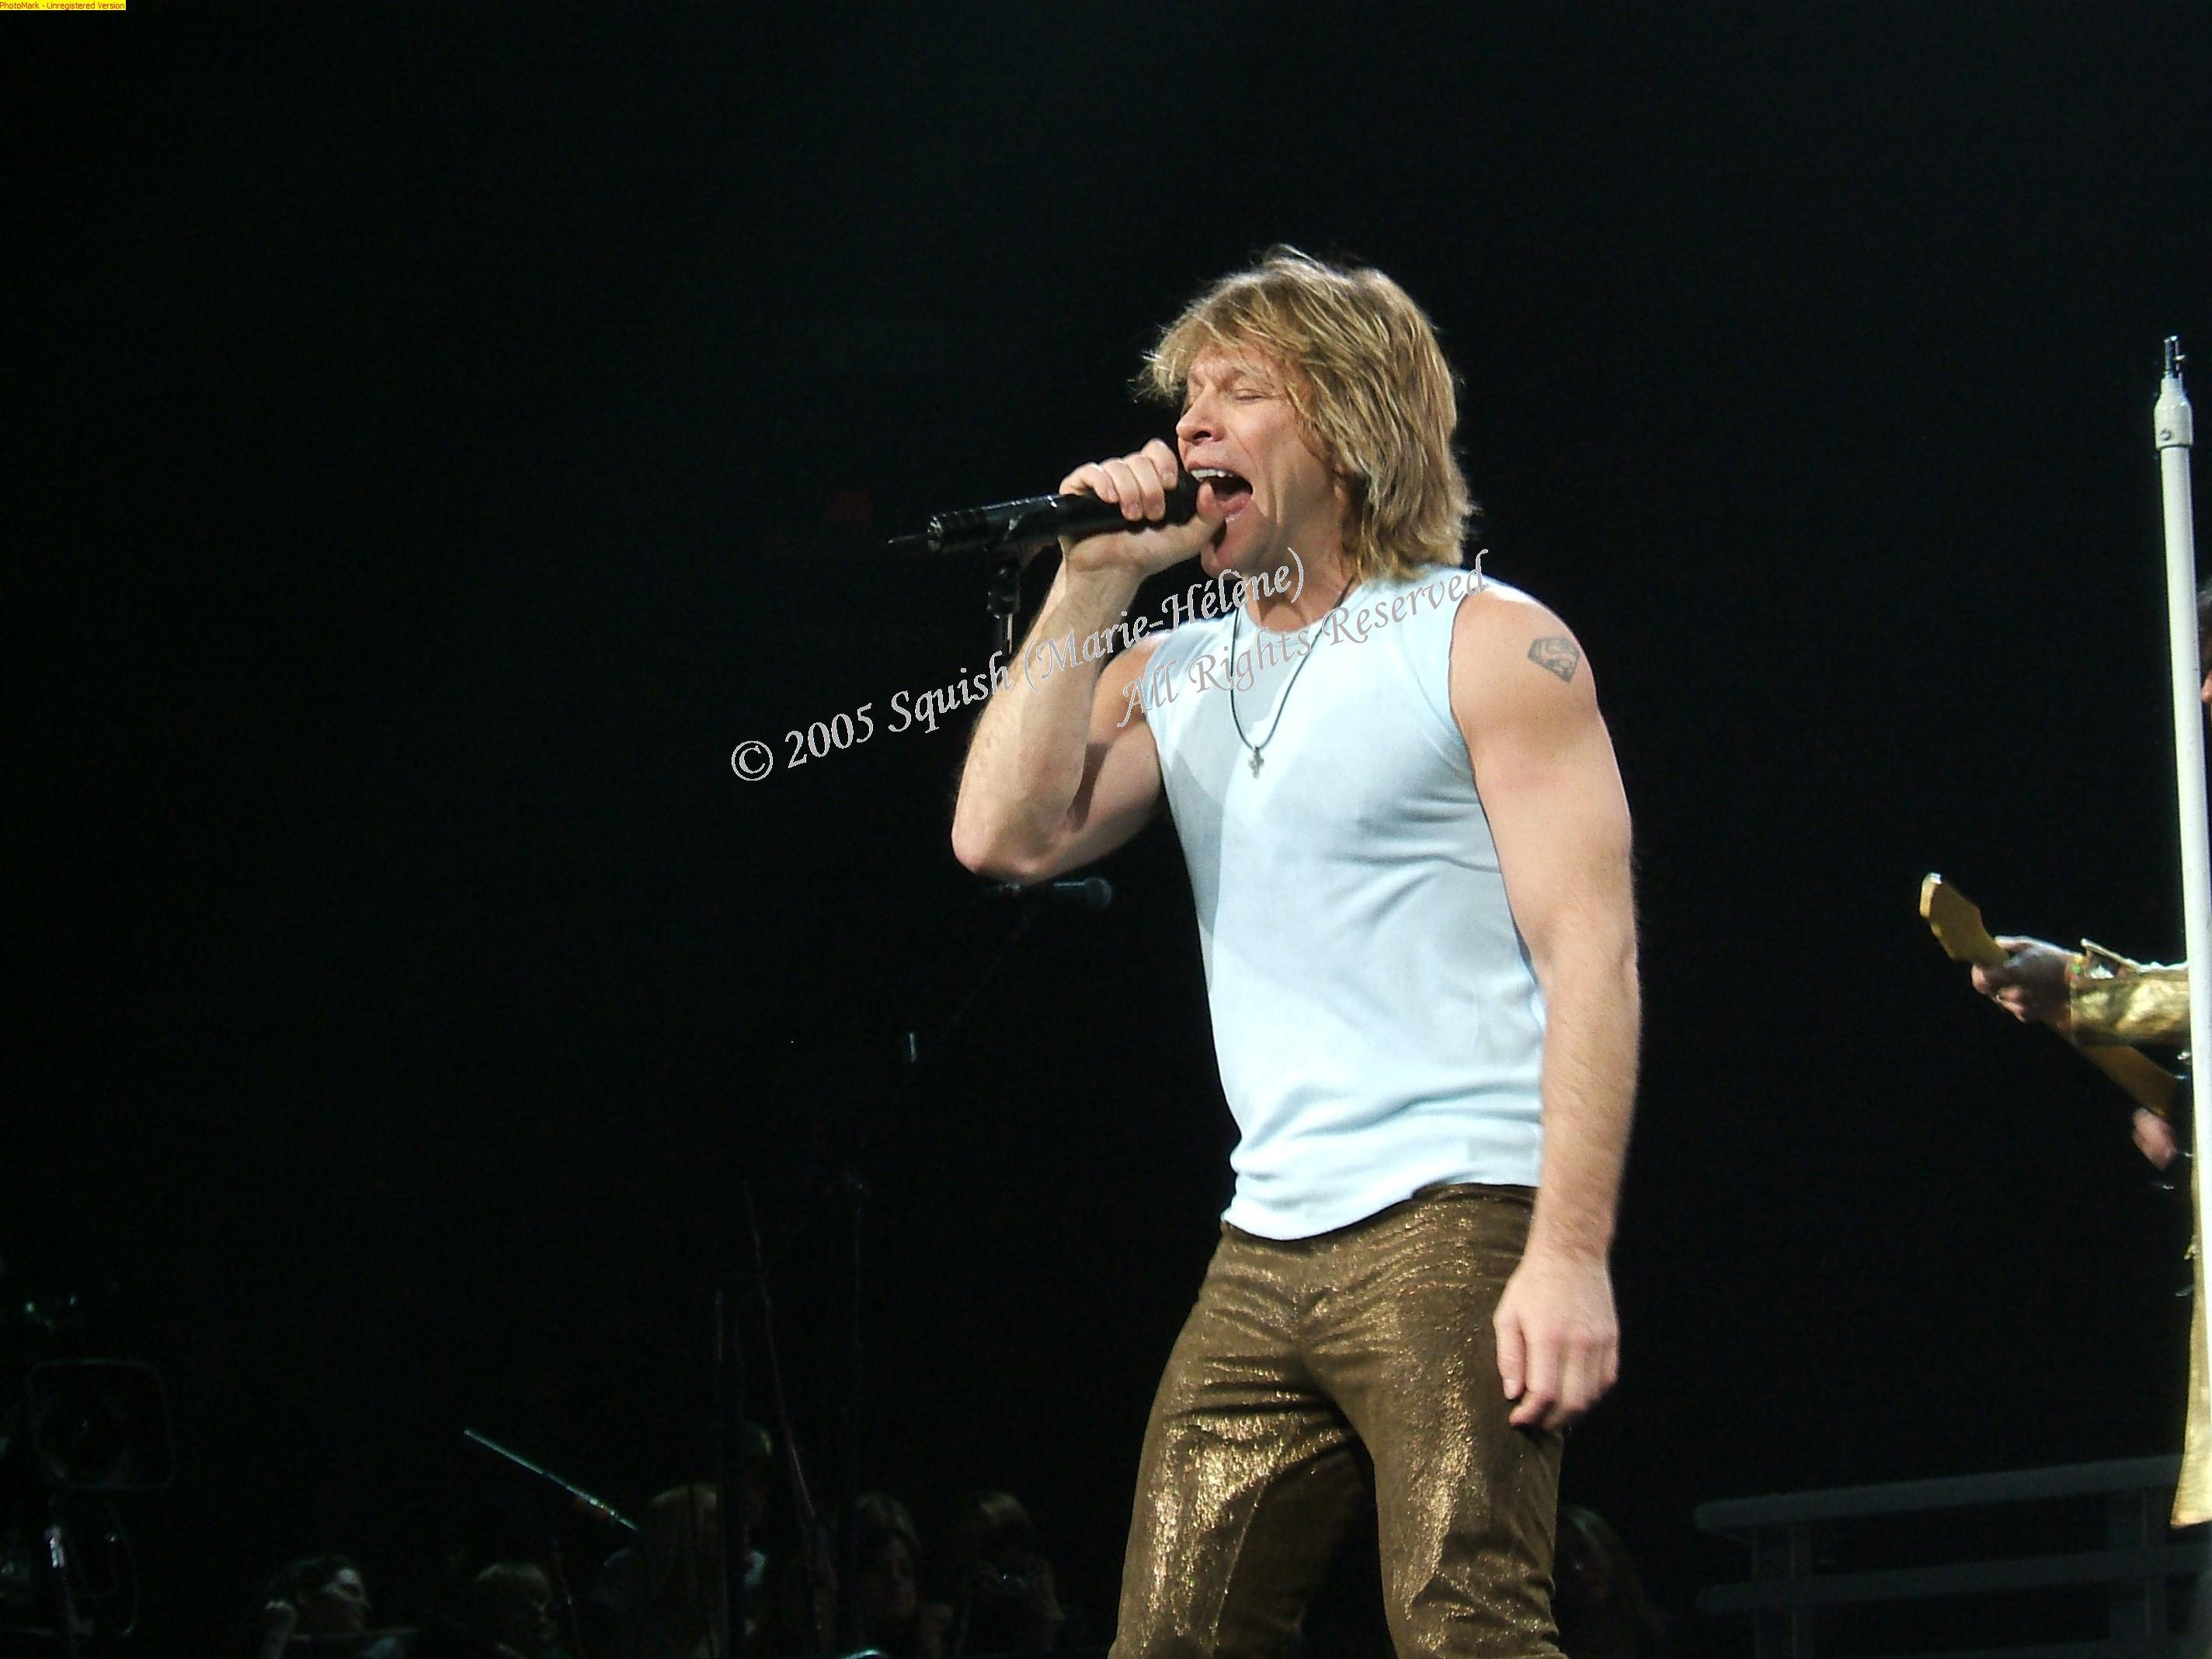 Bon Jovi - Bell Centre, Quebec, Canada (December 15, 2005)